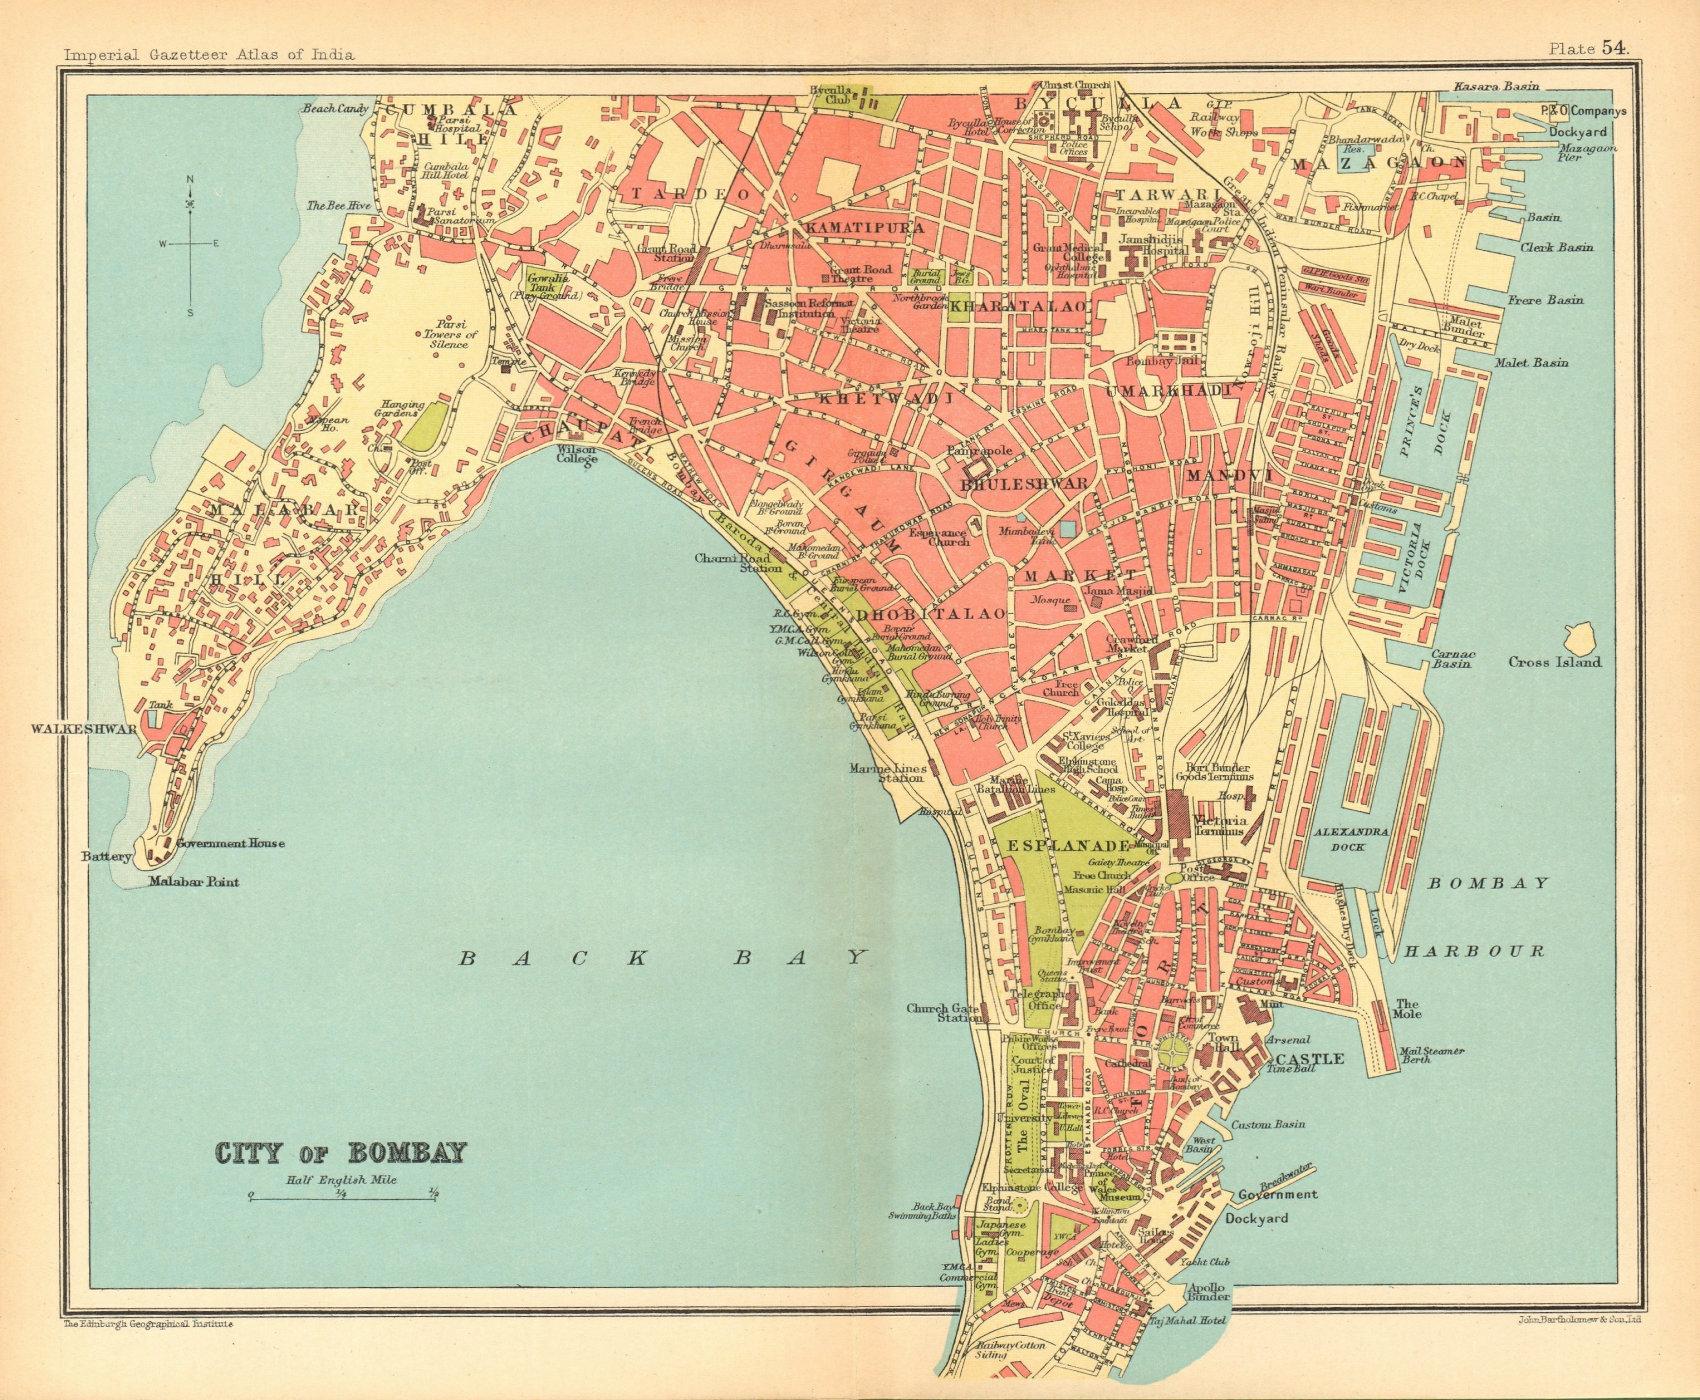 Associate Product Bombay / Mumbai town city plan. Key buildings & docks. British India 1931 map